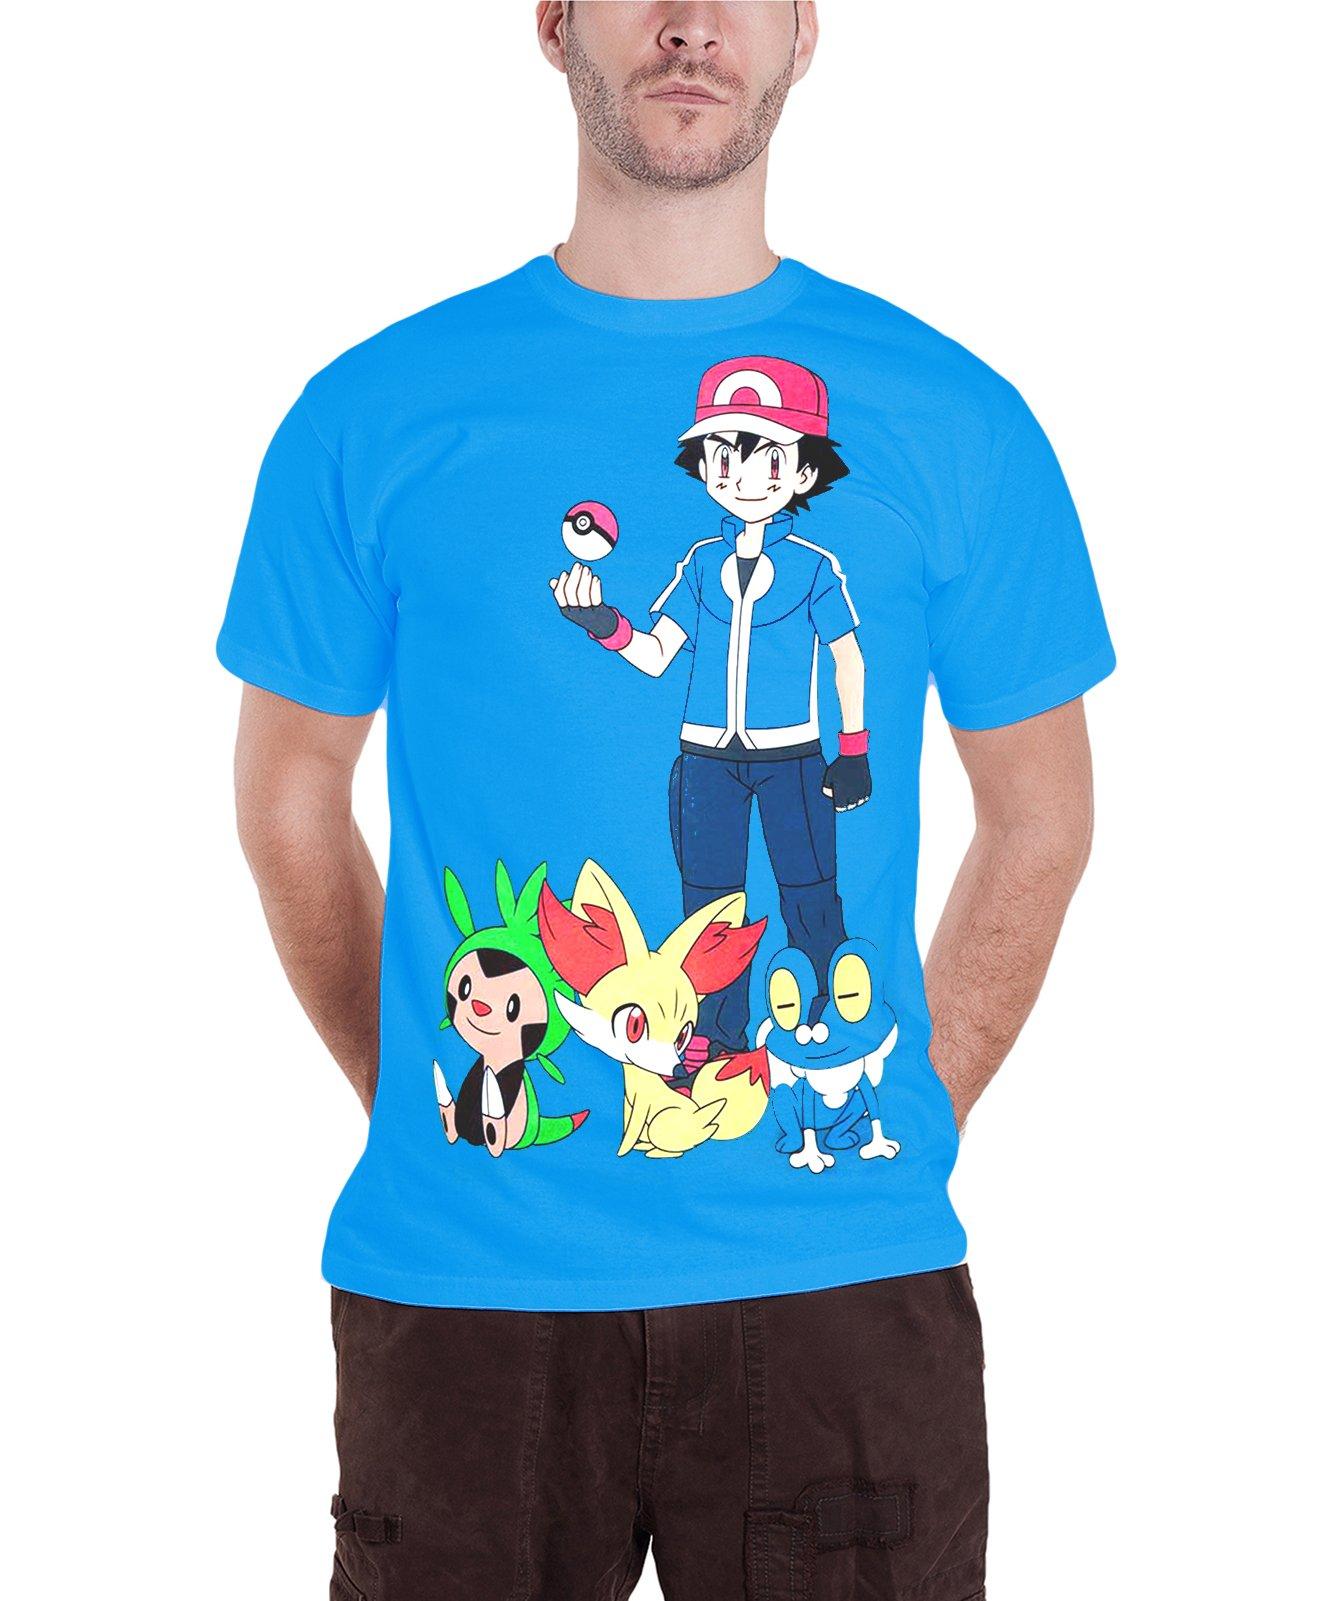 Pokemon T Shirt S Ash Ketchum Game Blue 5798